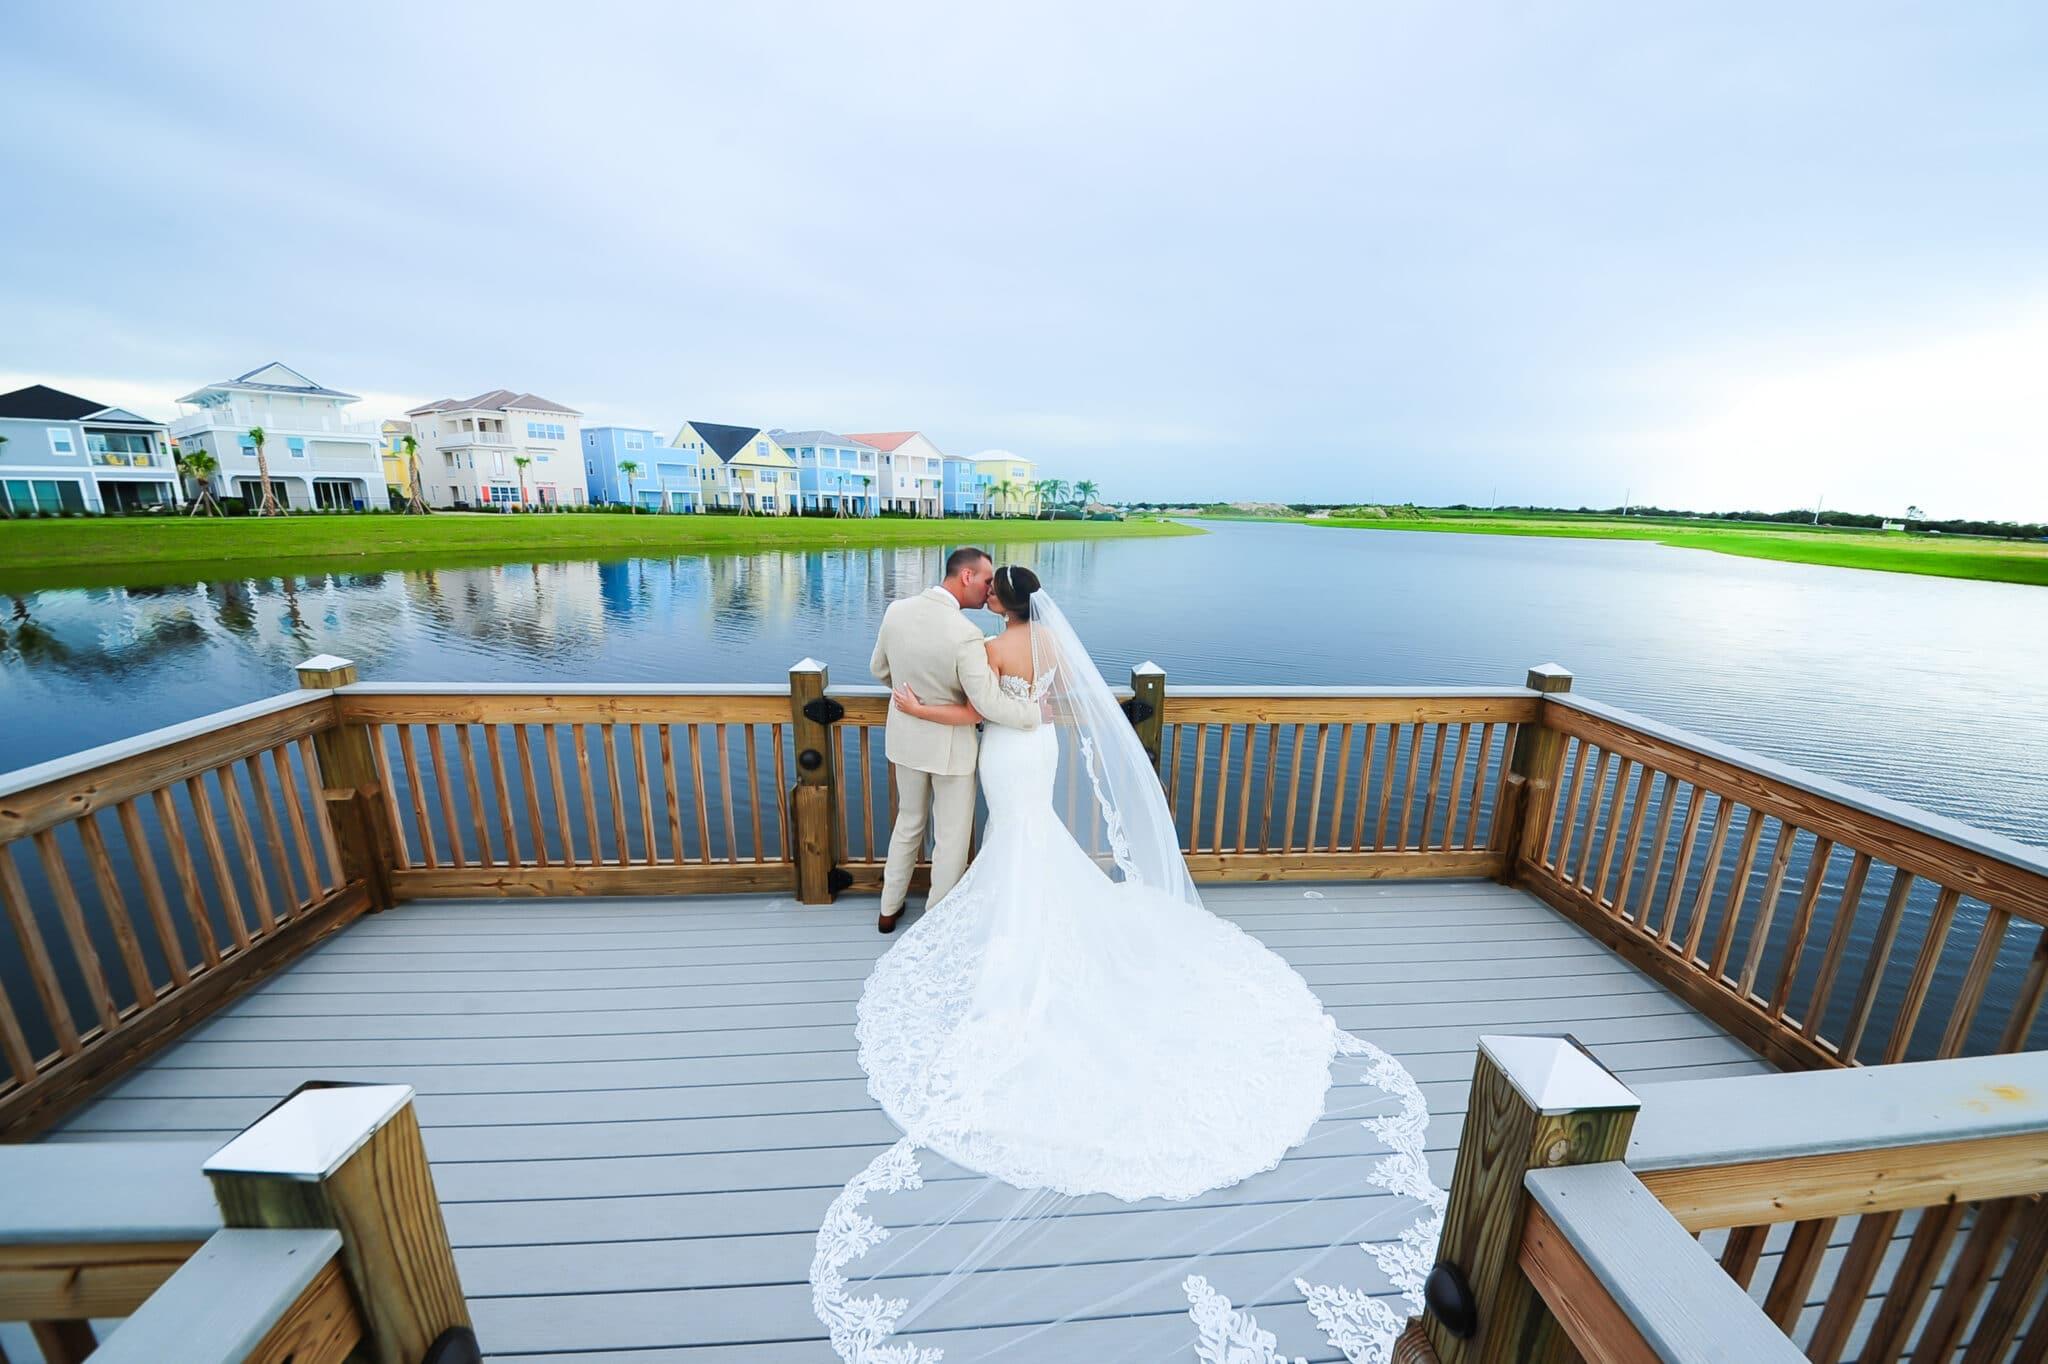 couple standing on deck overlooking water